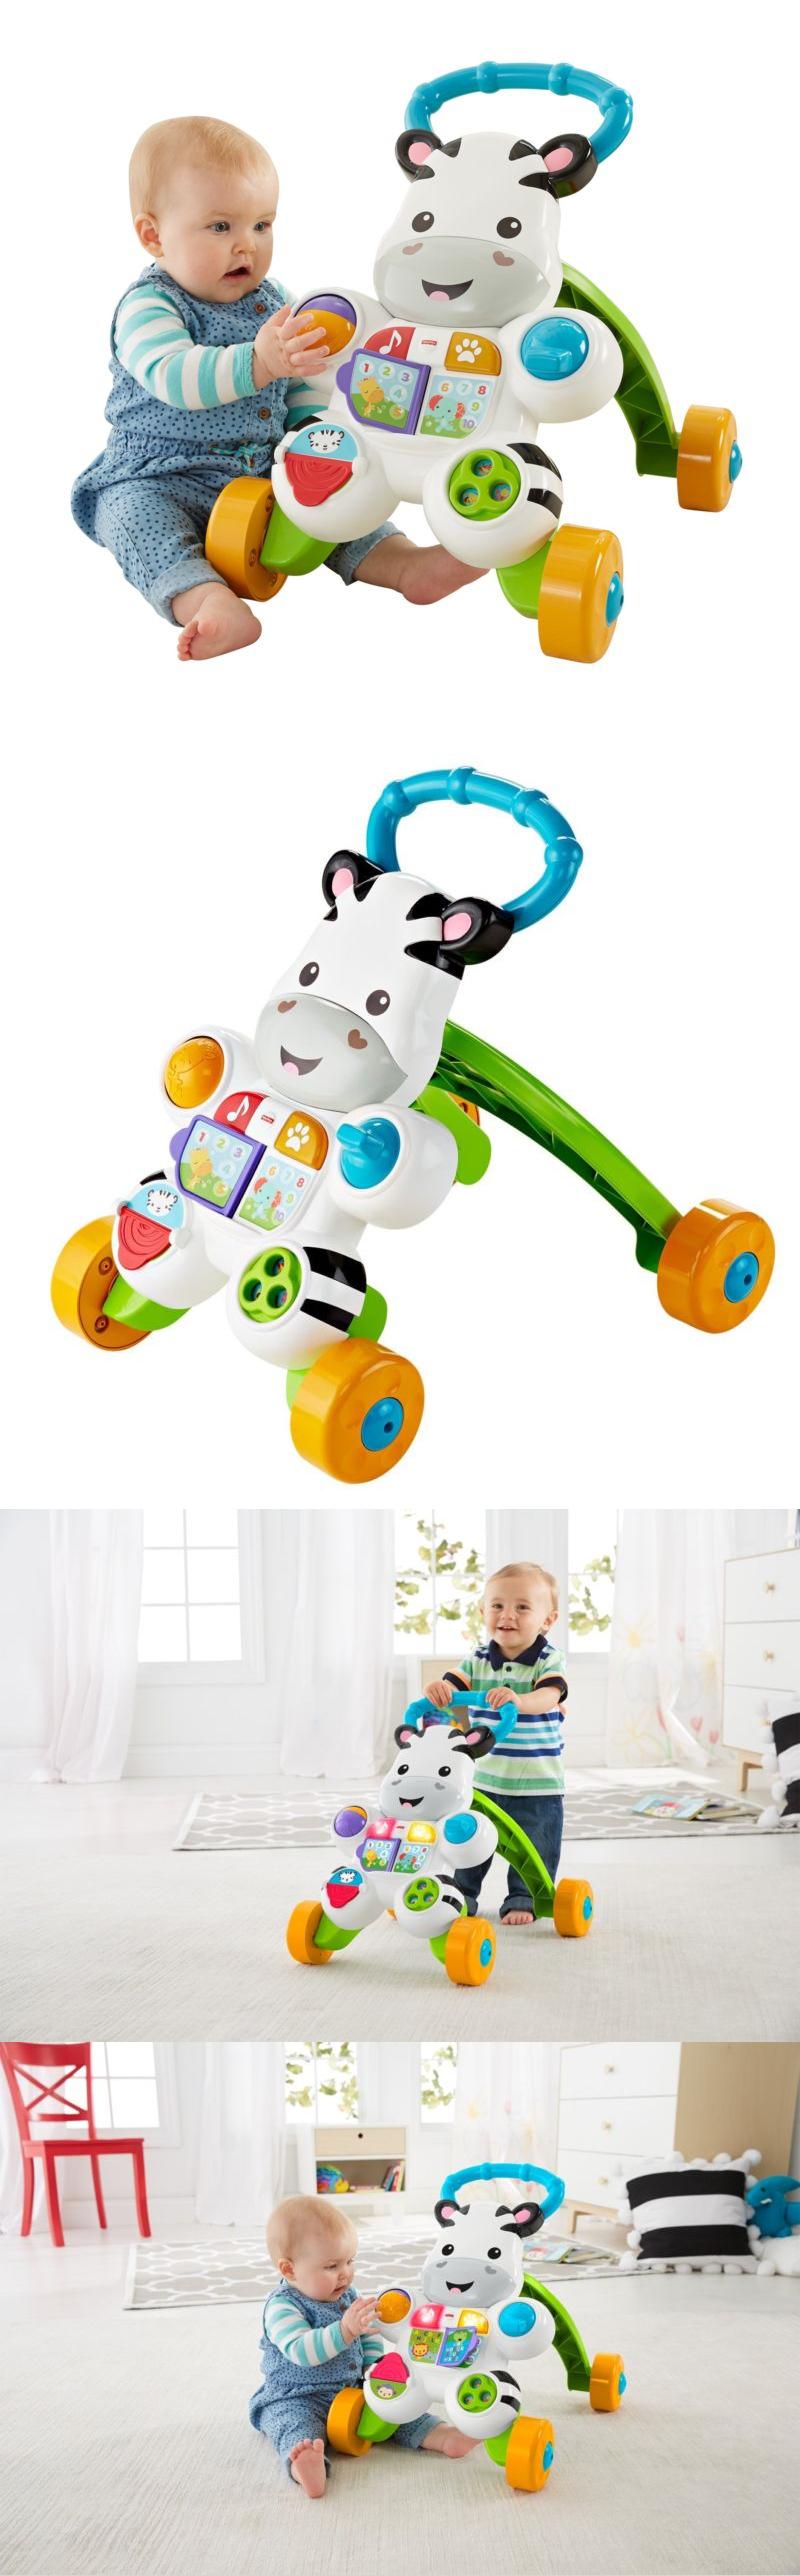 baby and kid stuff Toy Learning Walkertoddler Kids Baby Push Sit